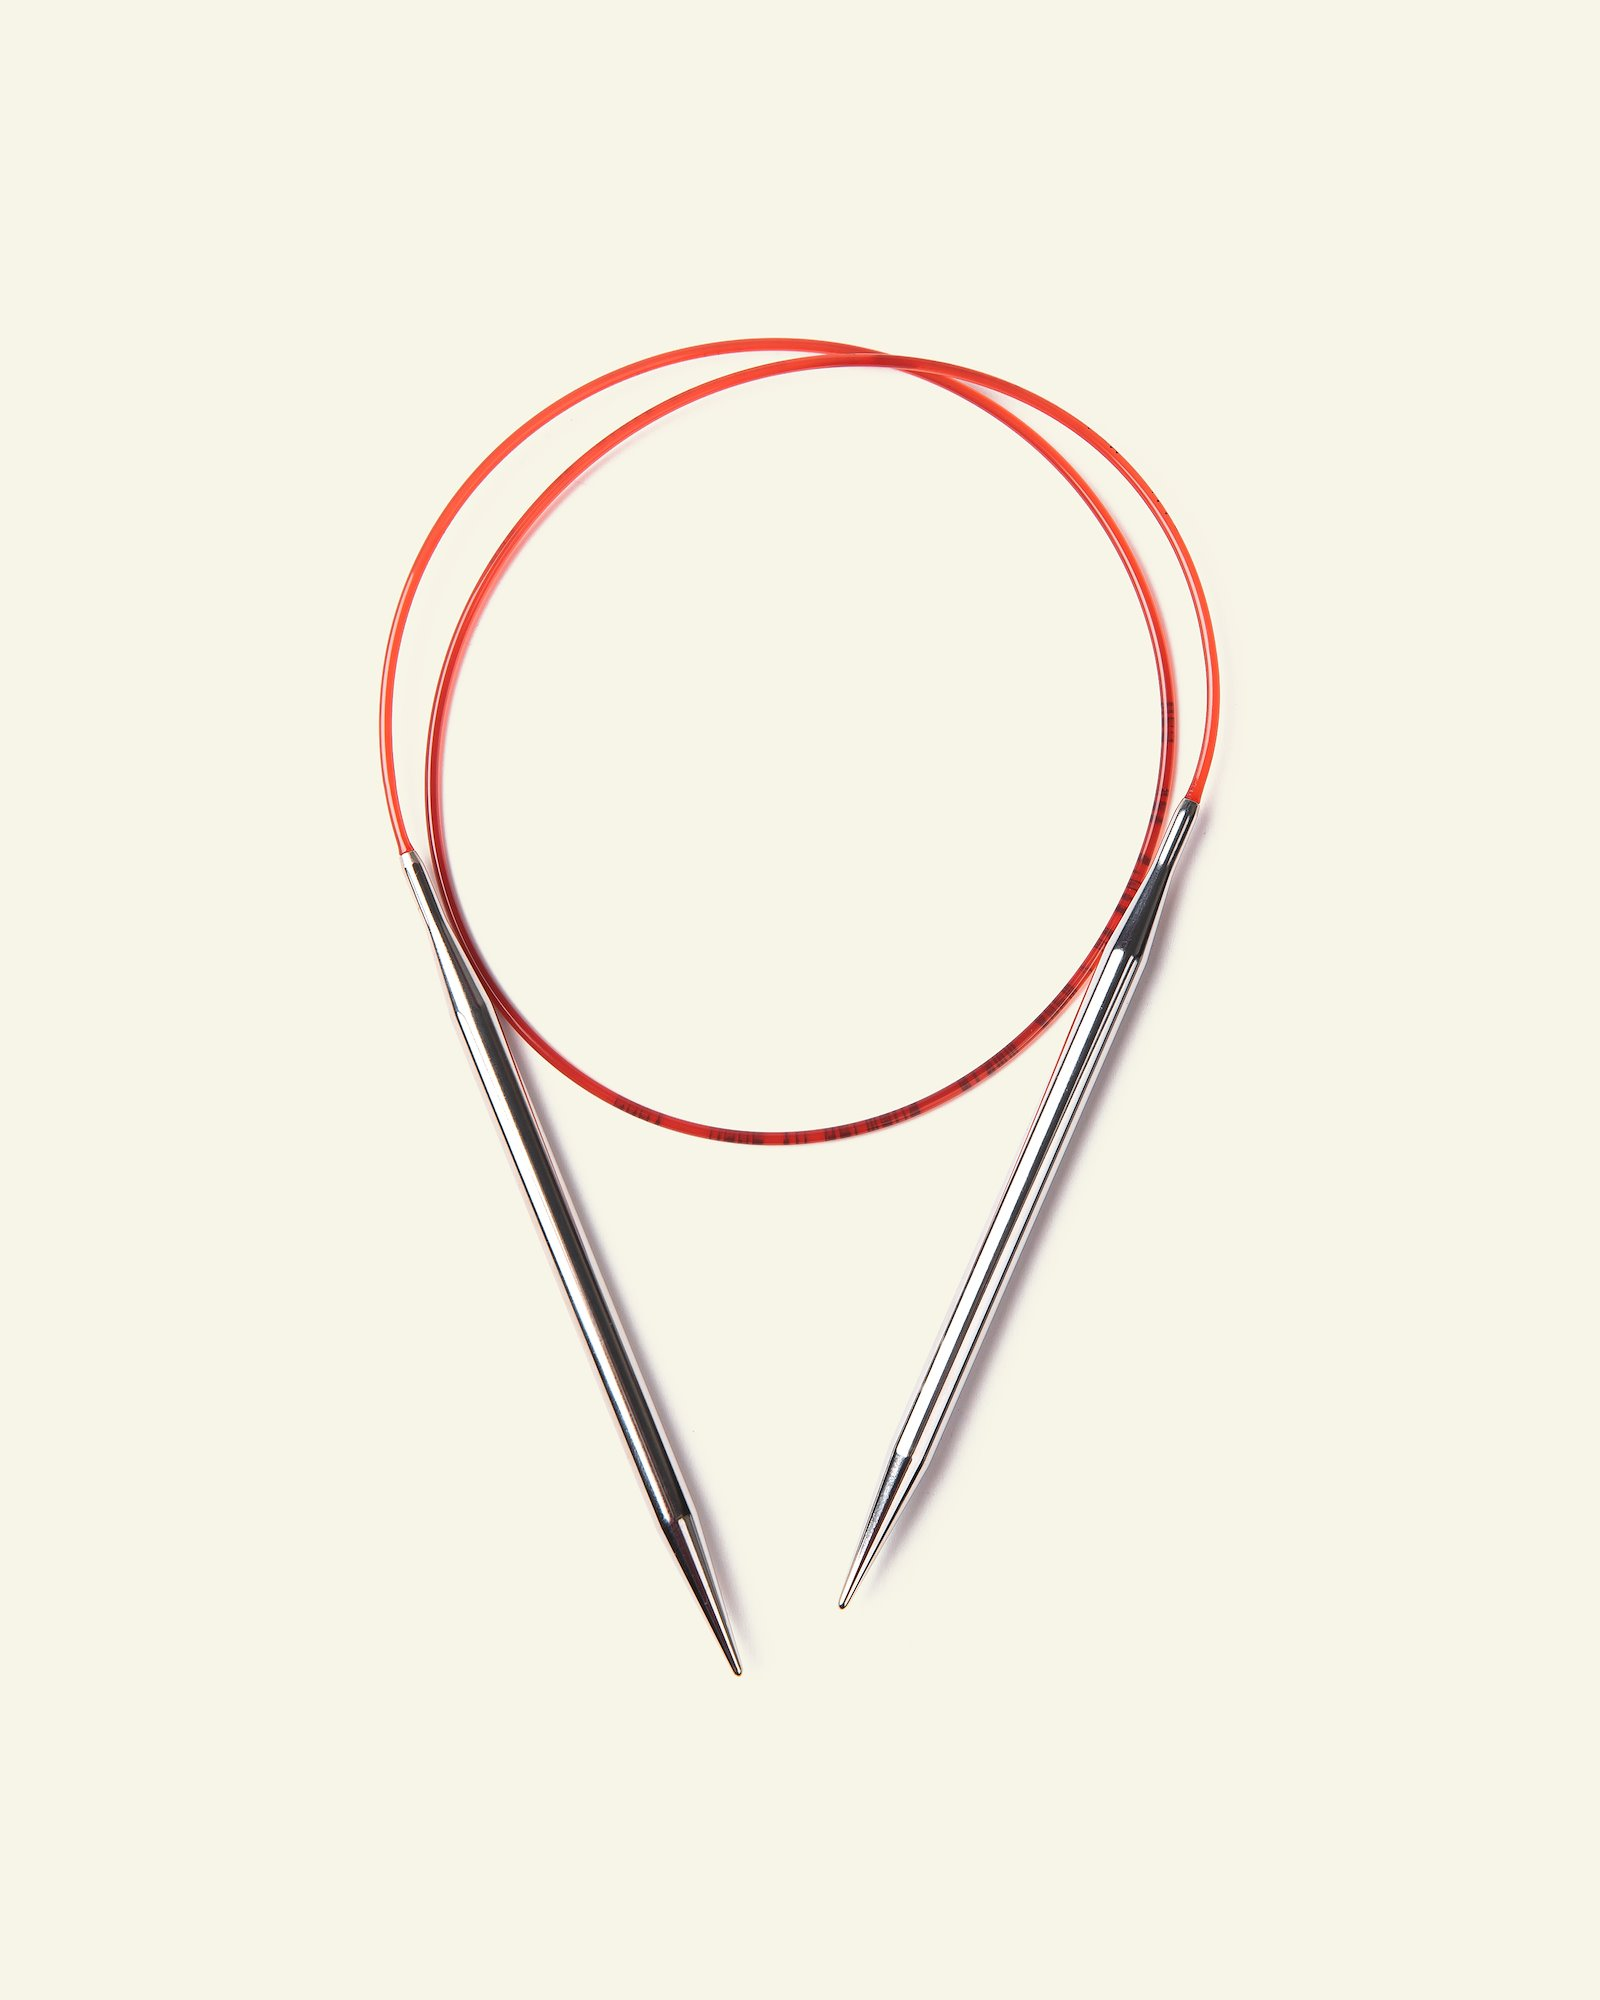 Addi Lace circular needle 80cm 7mm